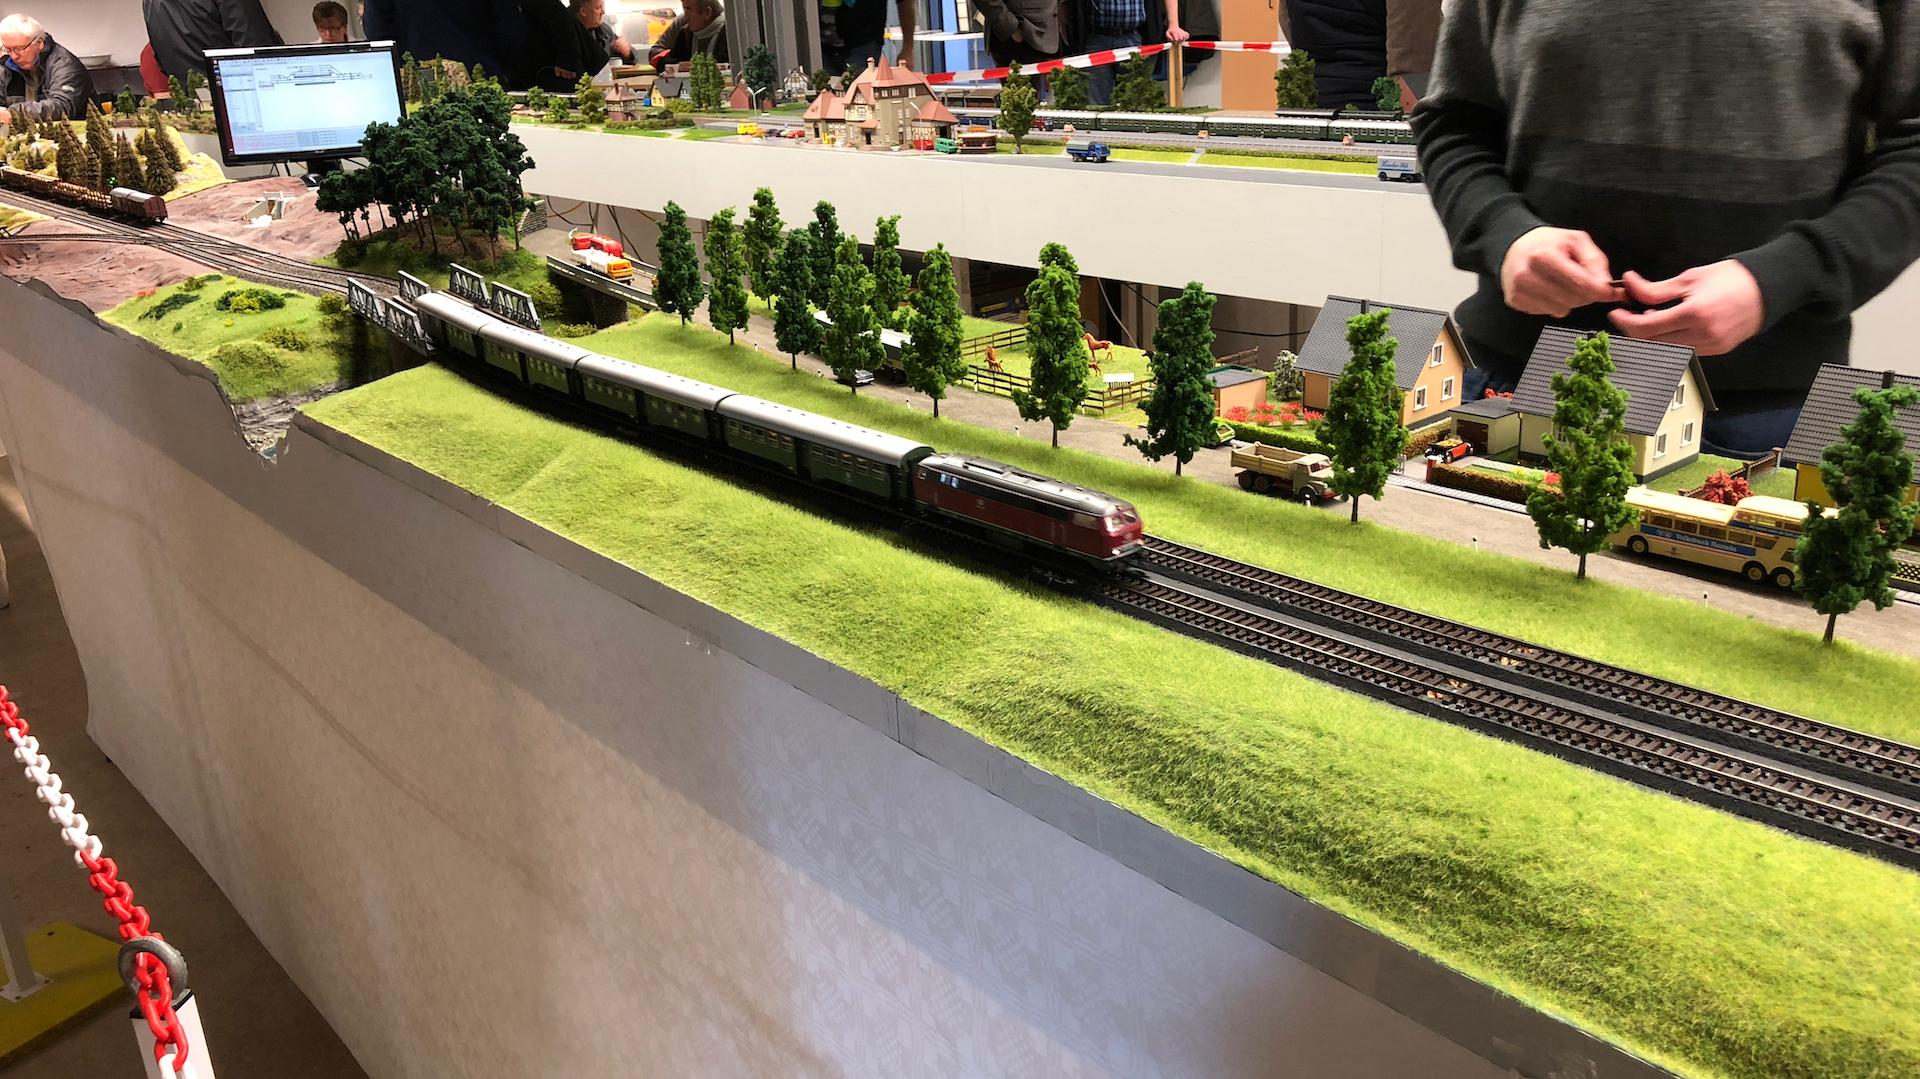 18_02_24_Schautag-Eisenbahnfreunde-Hameln_008